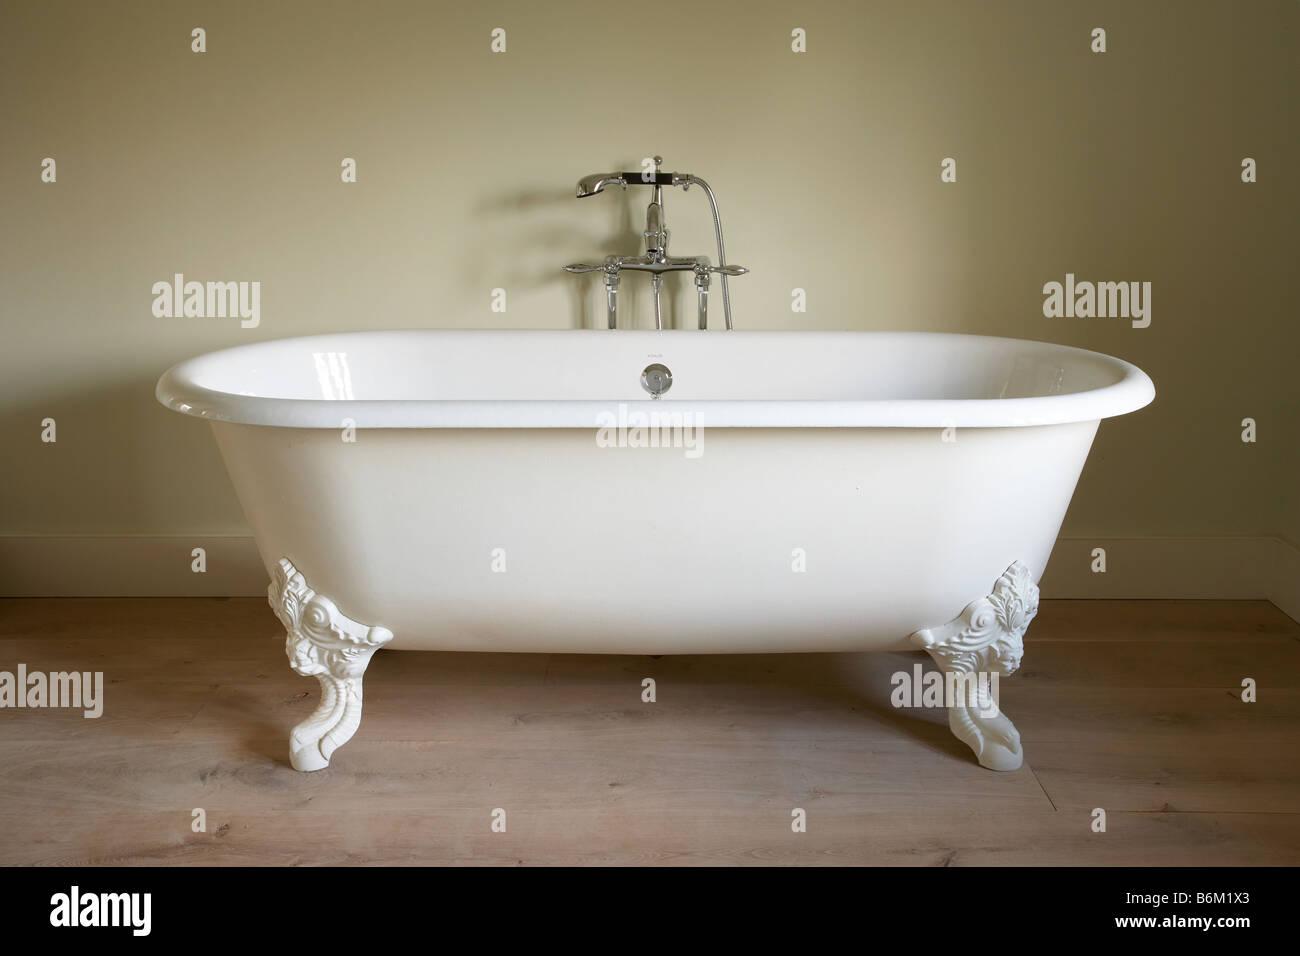 Free Standing Kohler Victorian Style Bath Bathtub Chrome